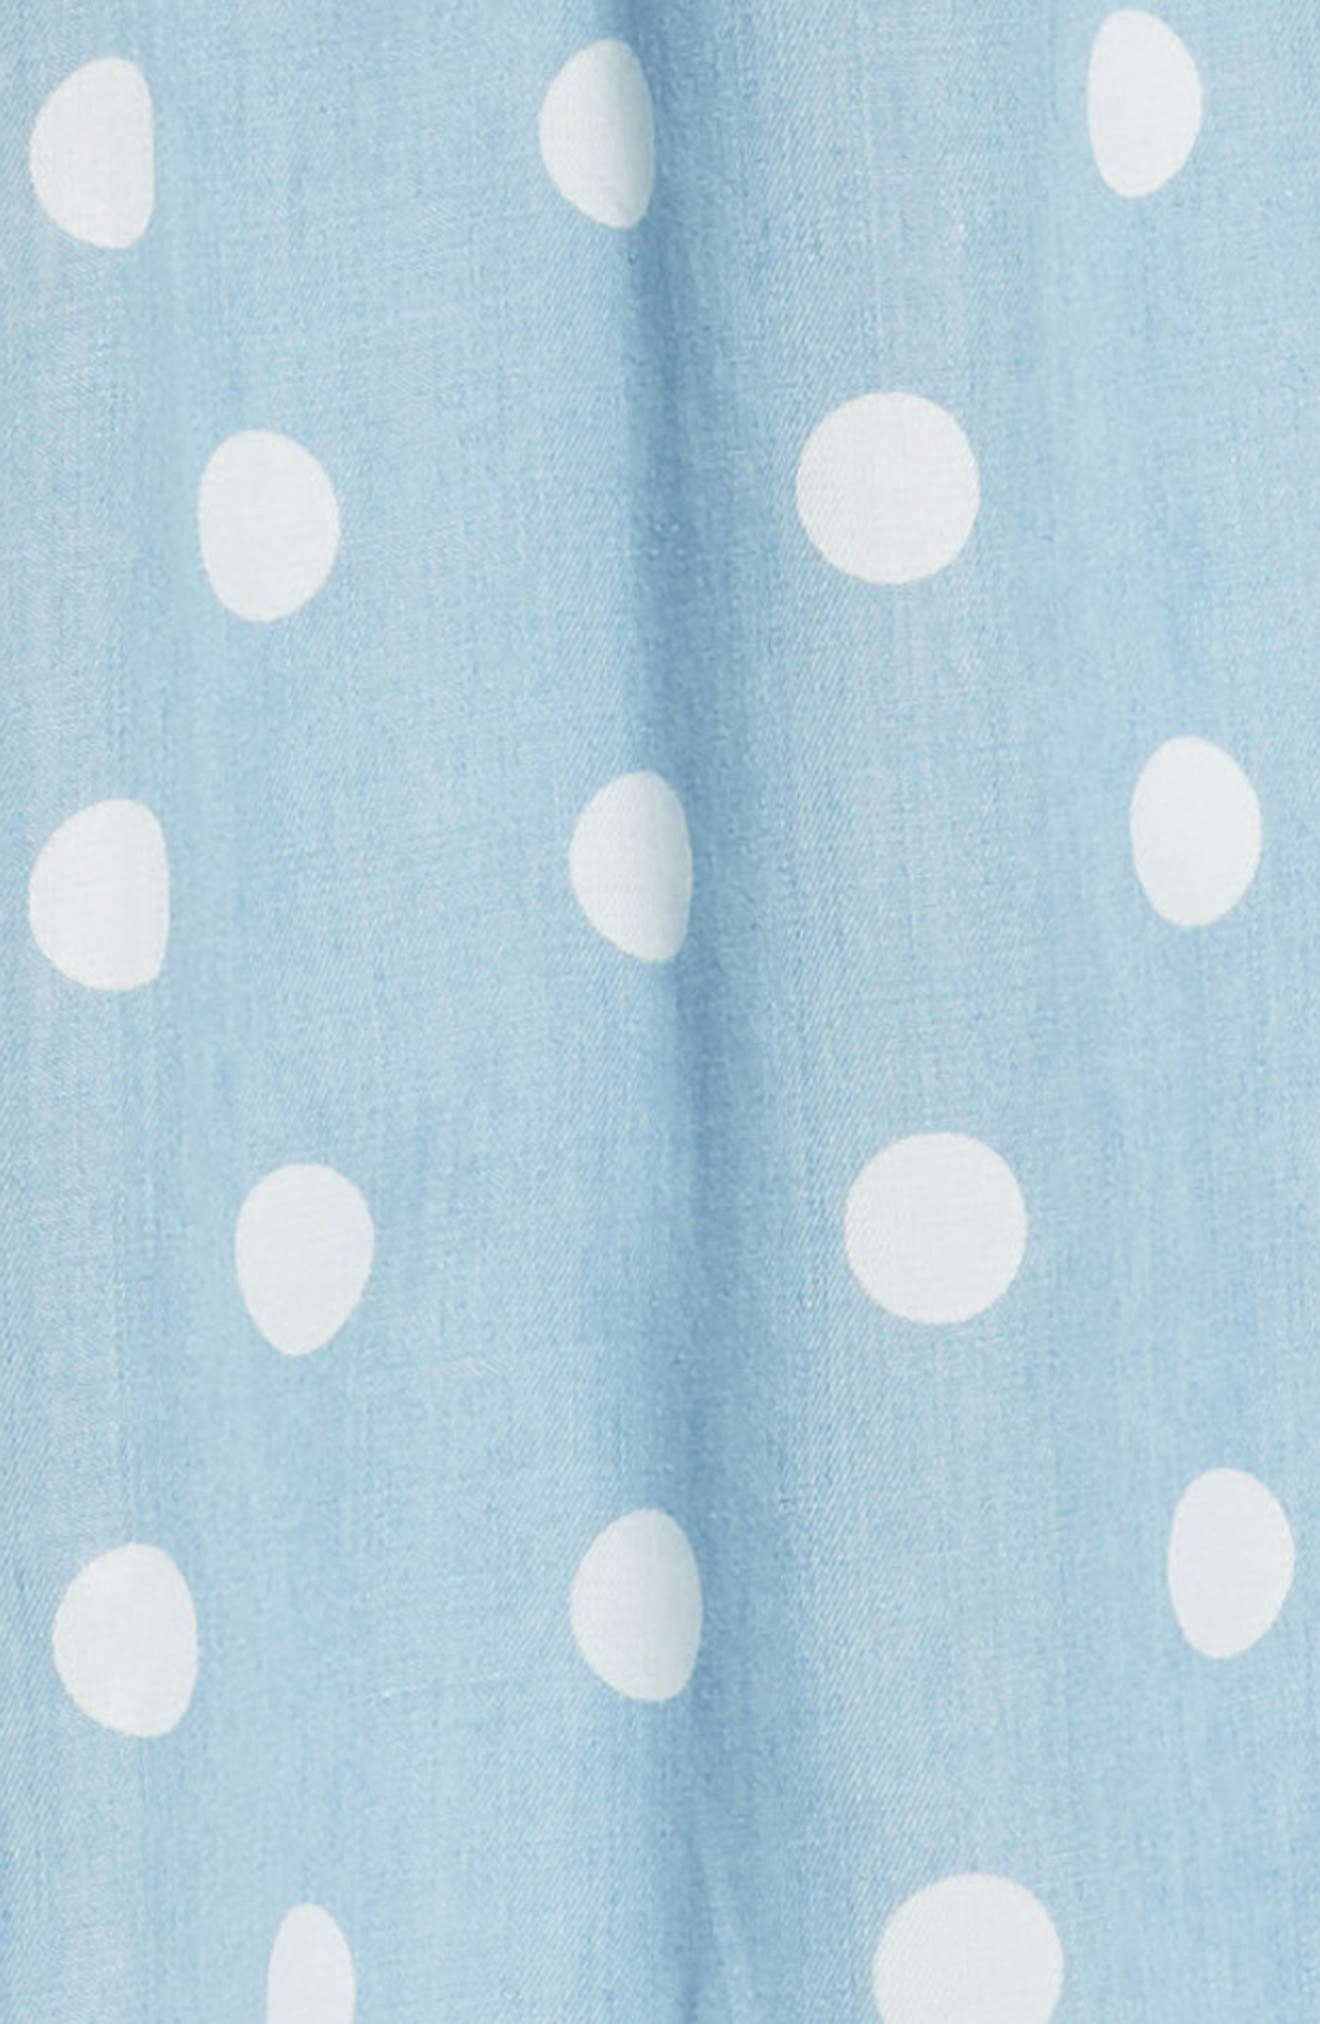 Polka Dot Ruffle Dress,                             Alternate thumbnail 3, color,                             Blue Wash Dot Print